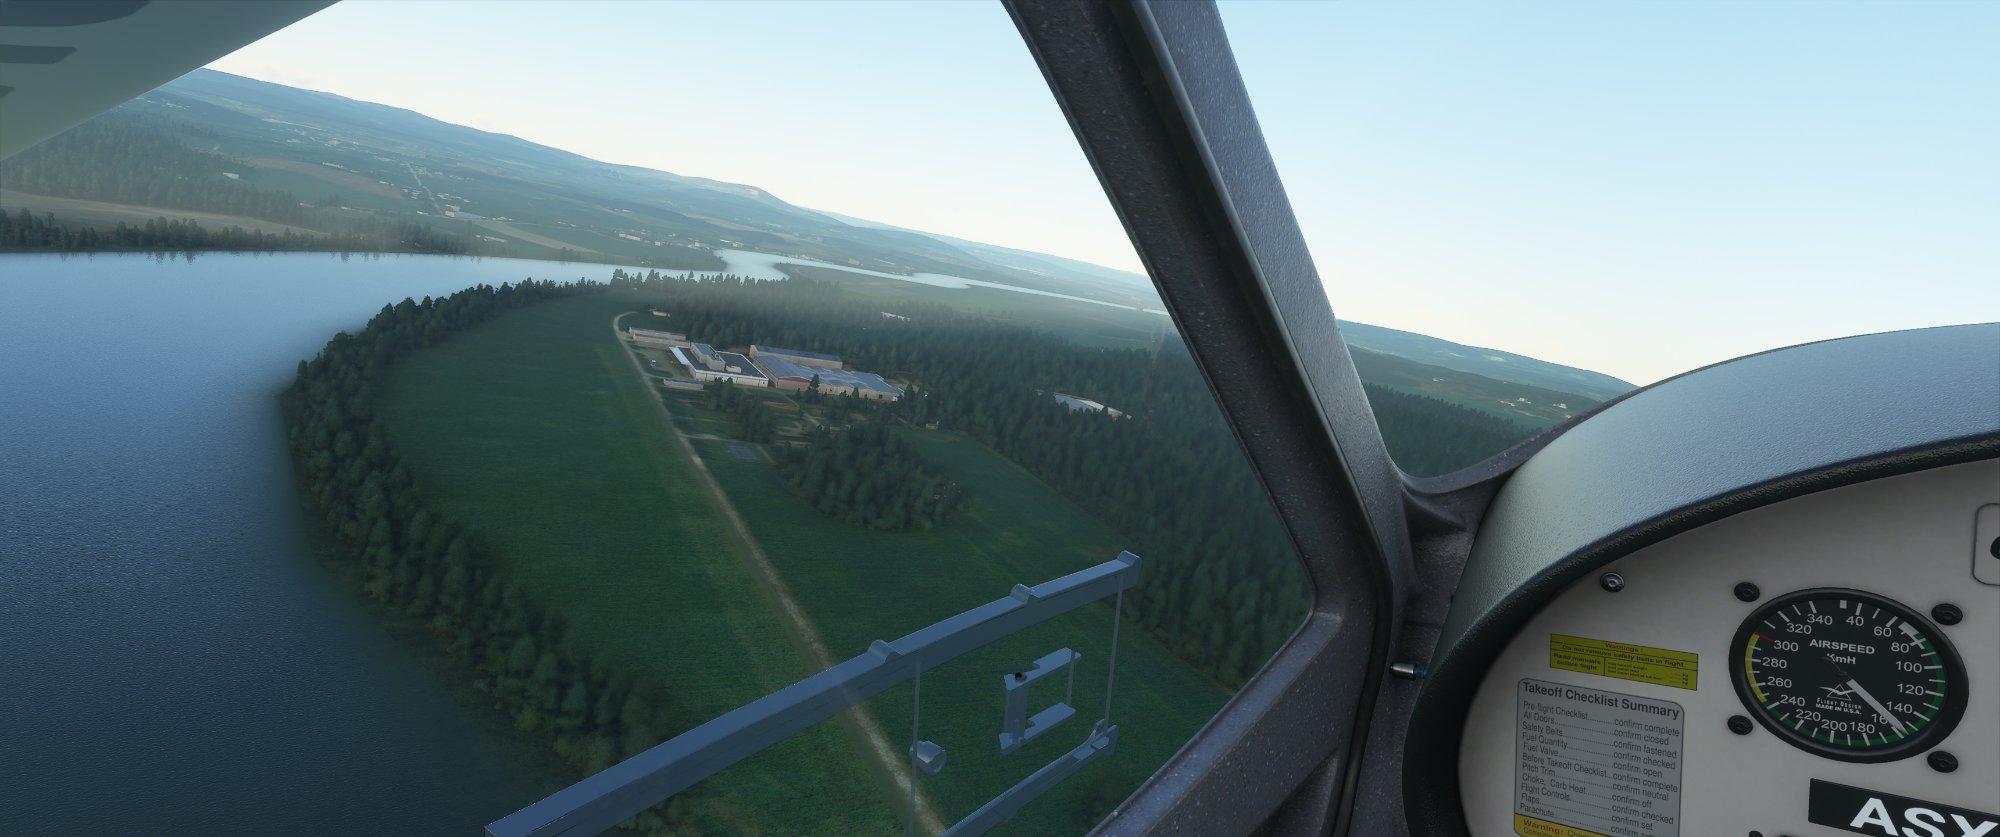 Microsoft Flight Simulator Screenshot 2020.10.05 - 17.09.02.09.jpg